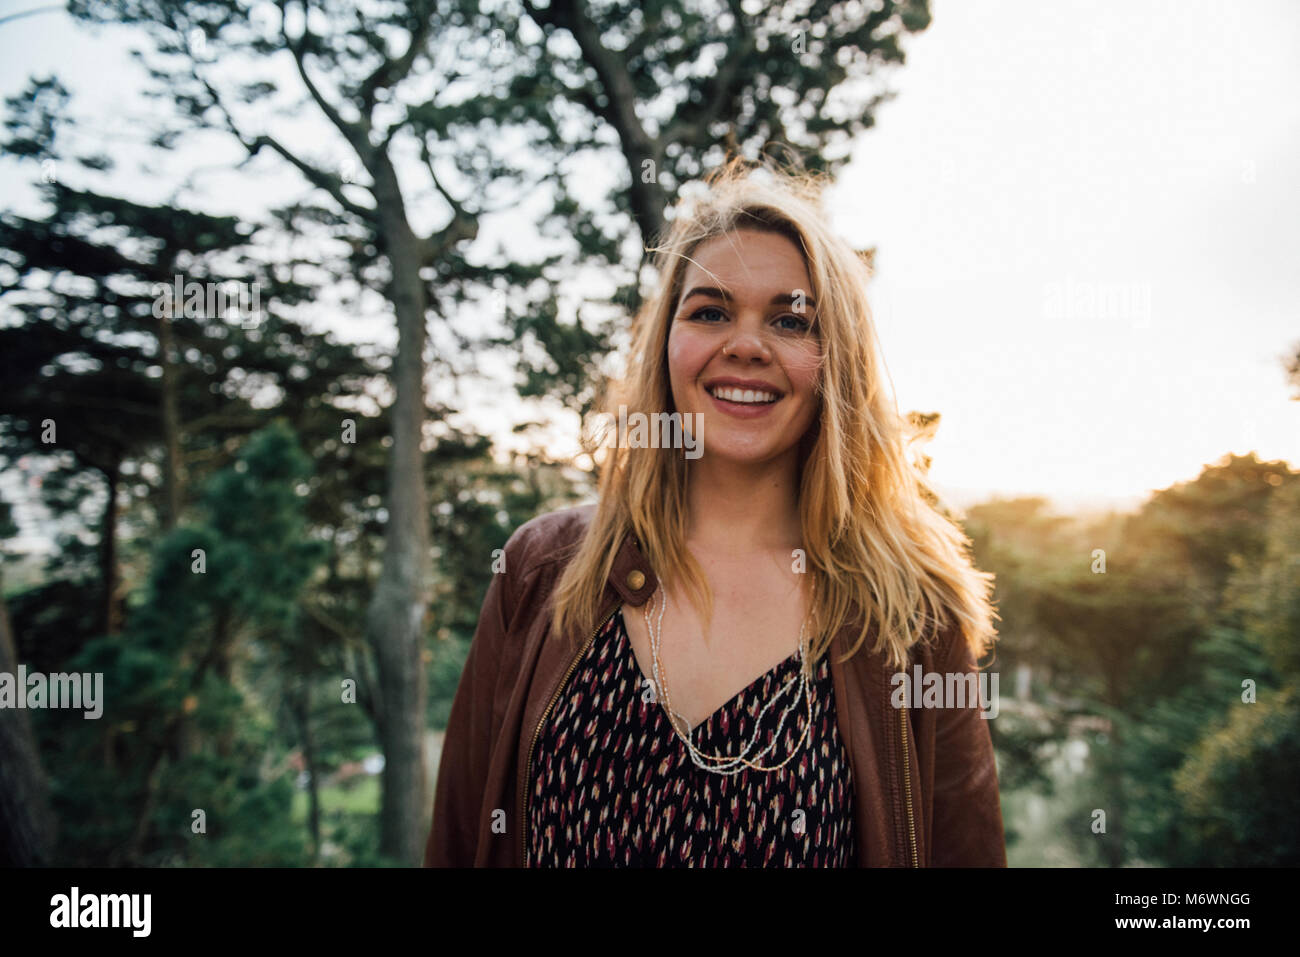 Junge Frau Golden Gate Park bei Sonnenuntergang zu erkunden. Stockbild